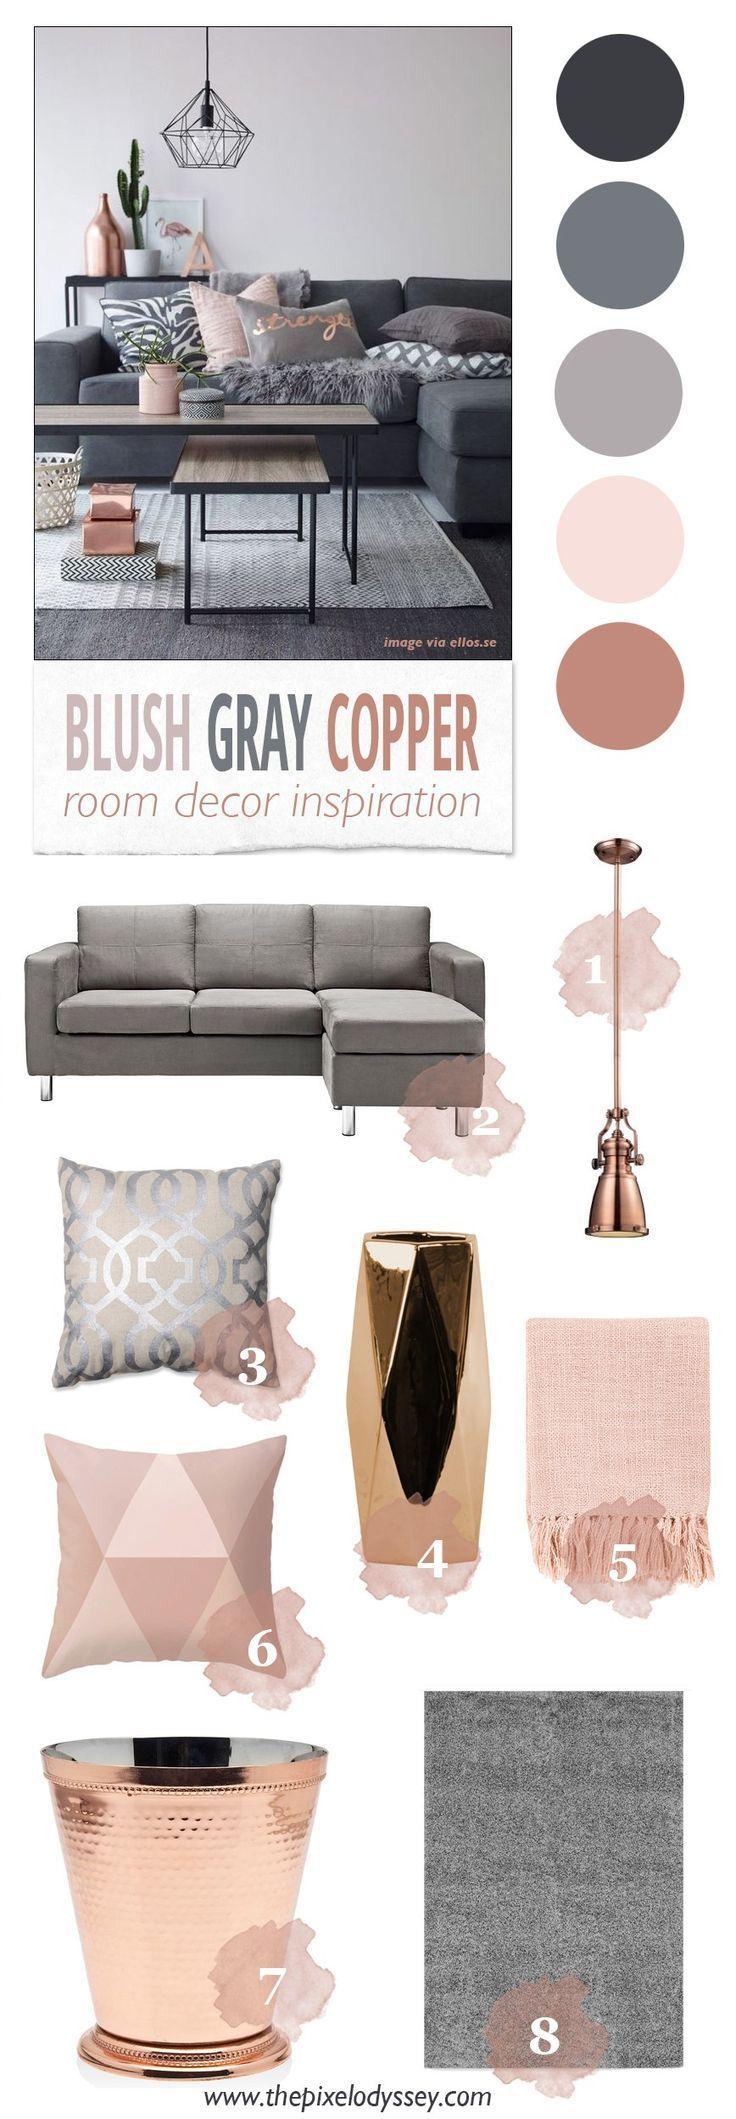 Blush Gray Copper Room Decor Inspiration | Pinterest | Room decor ...